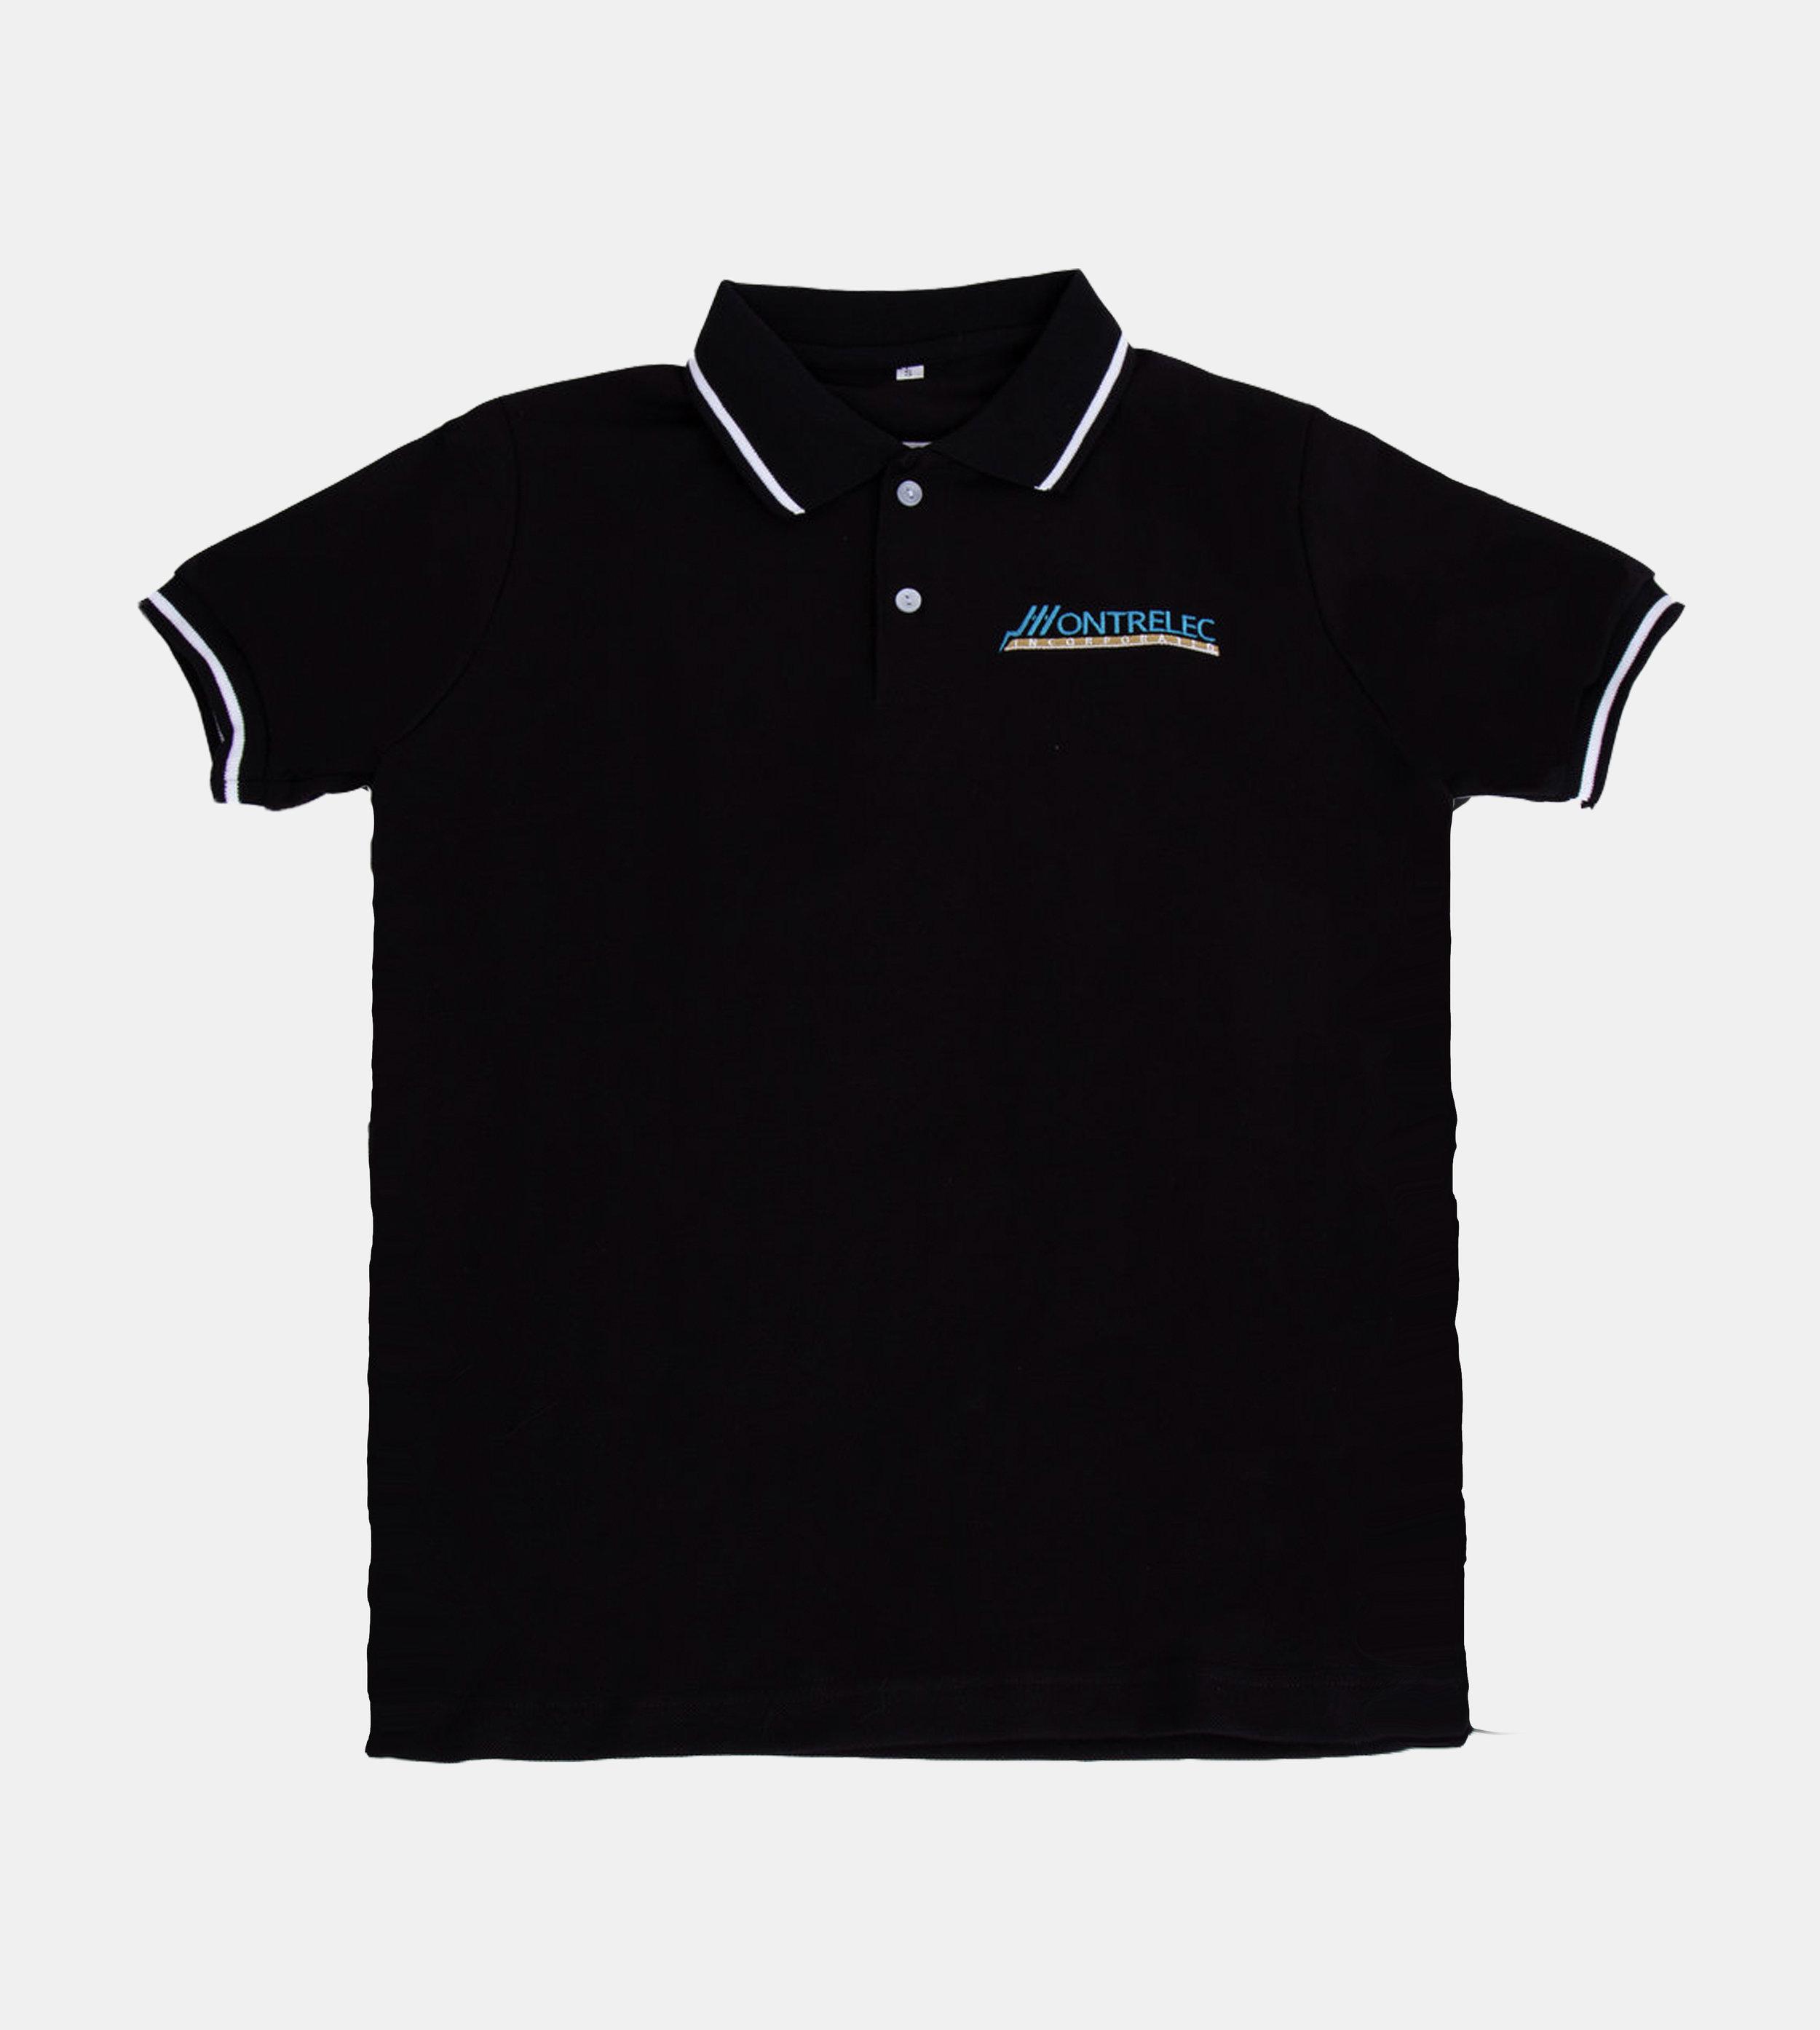 Tailored Projects-Custom Shirt- Polo Shirt-Montrelec.jpg